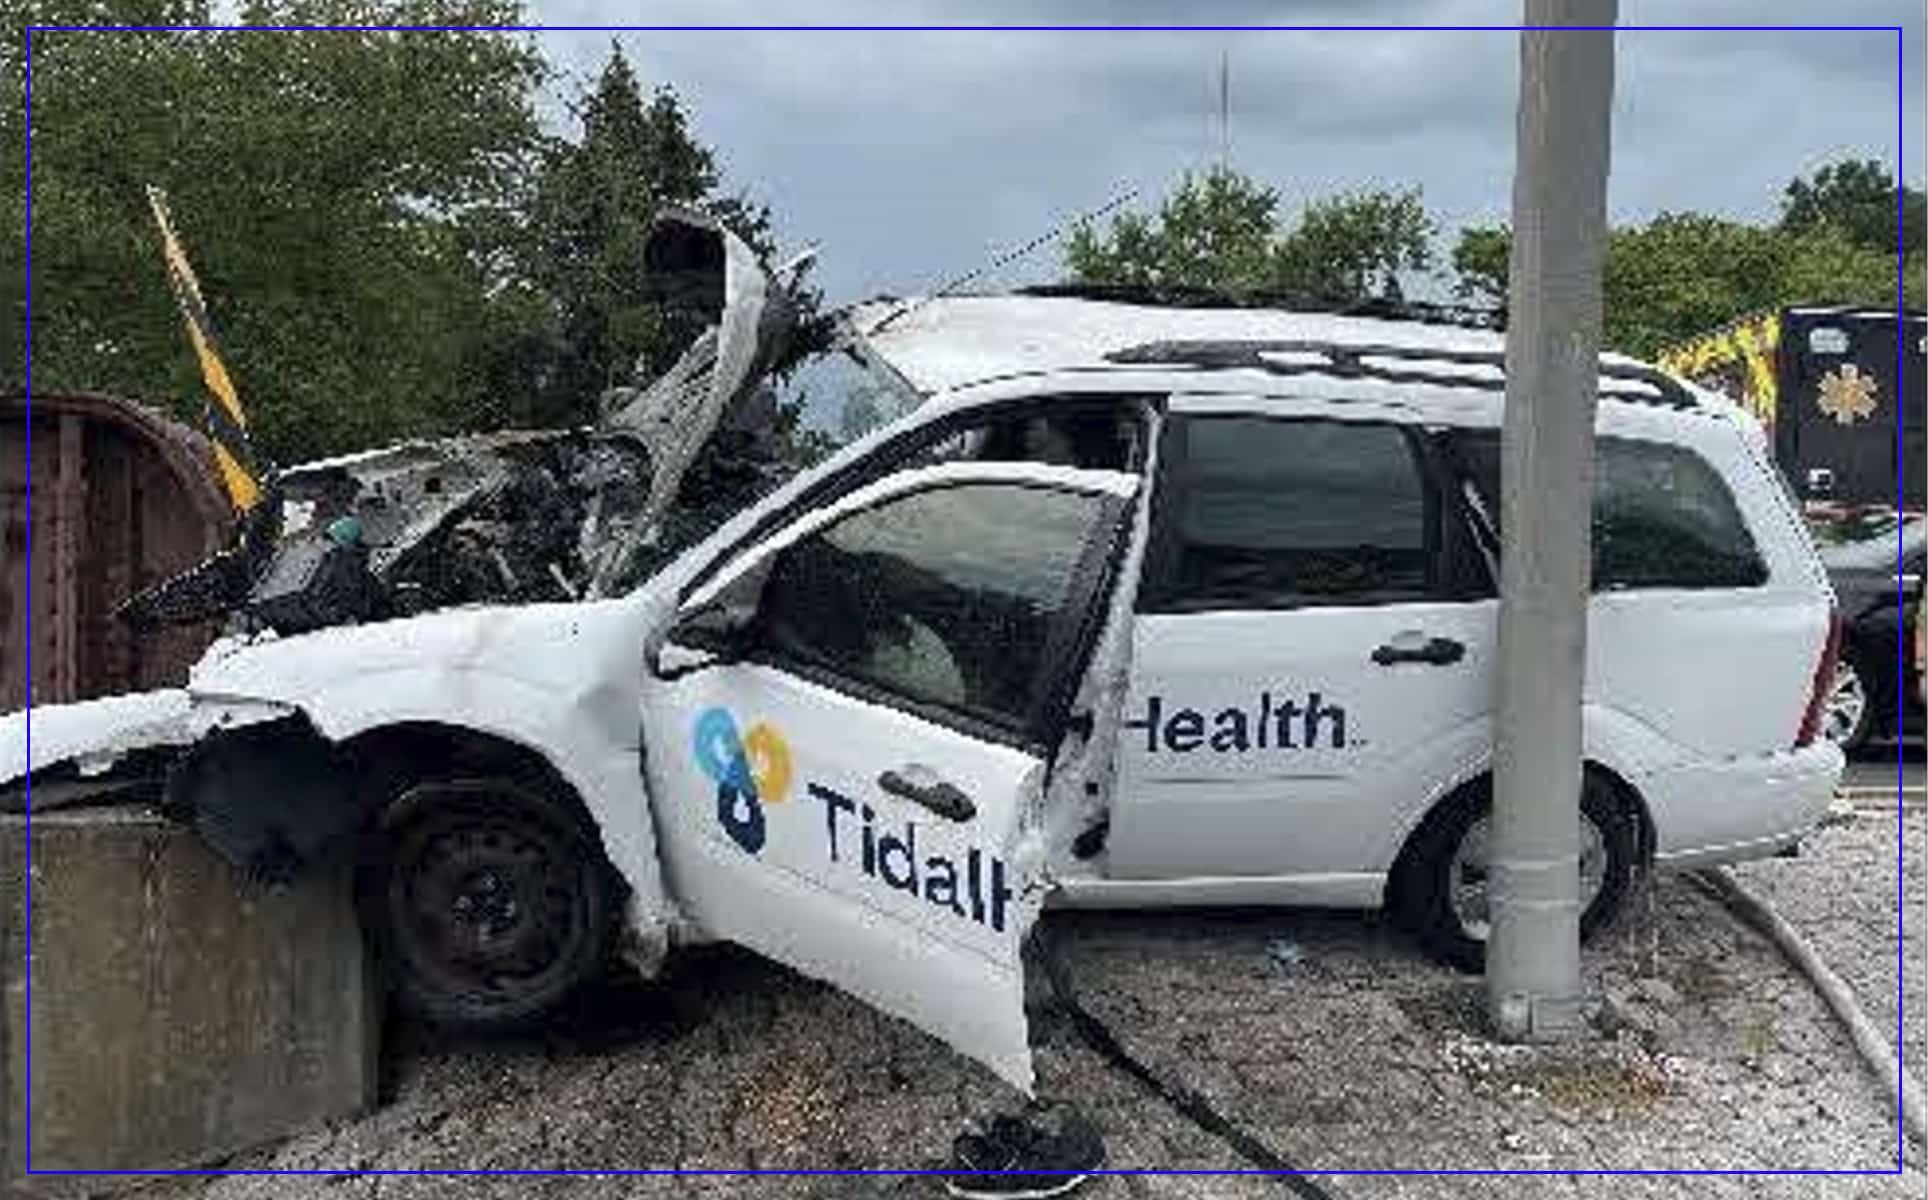 Tidal Health Vehicle